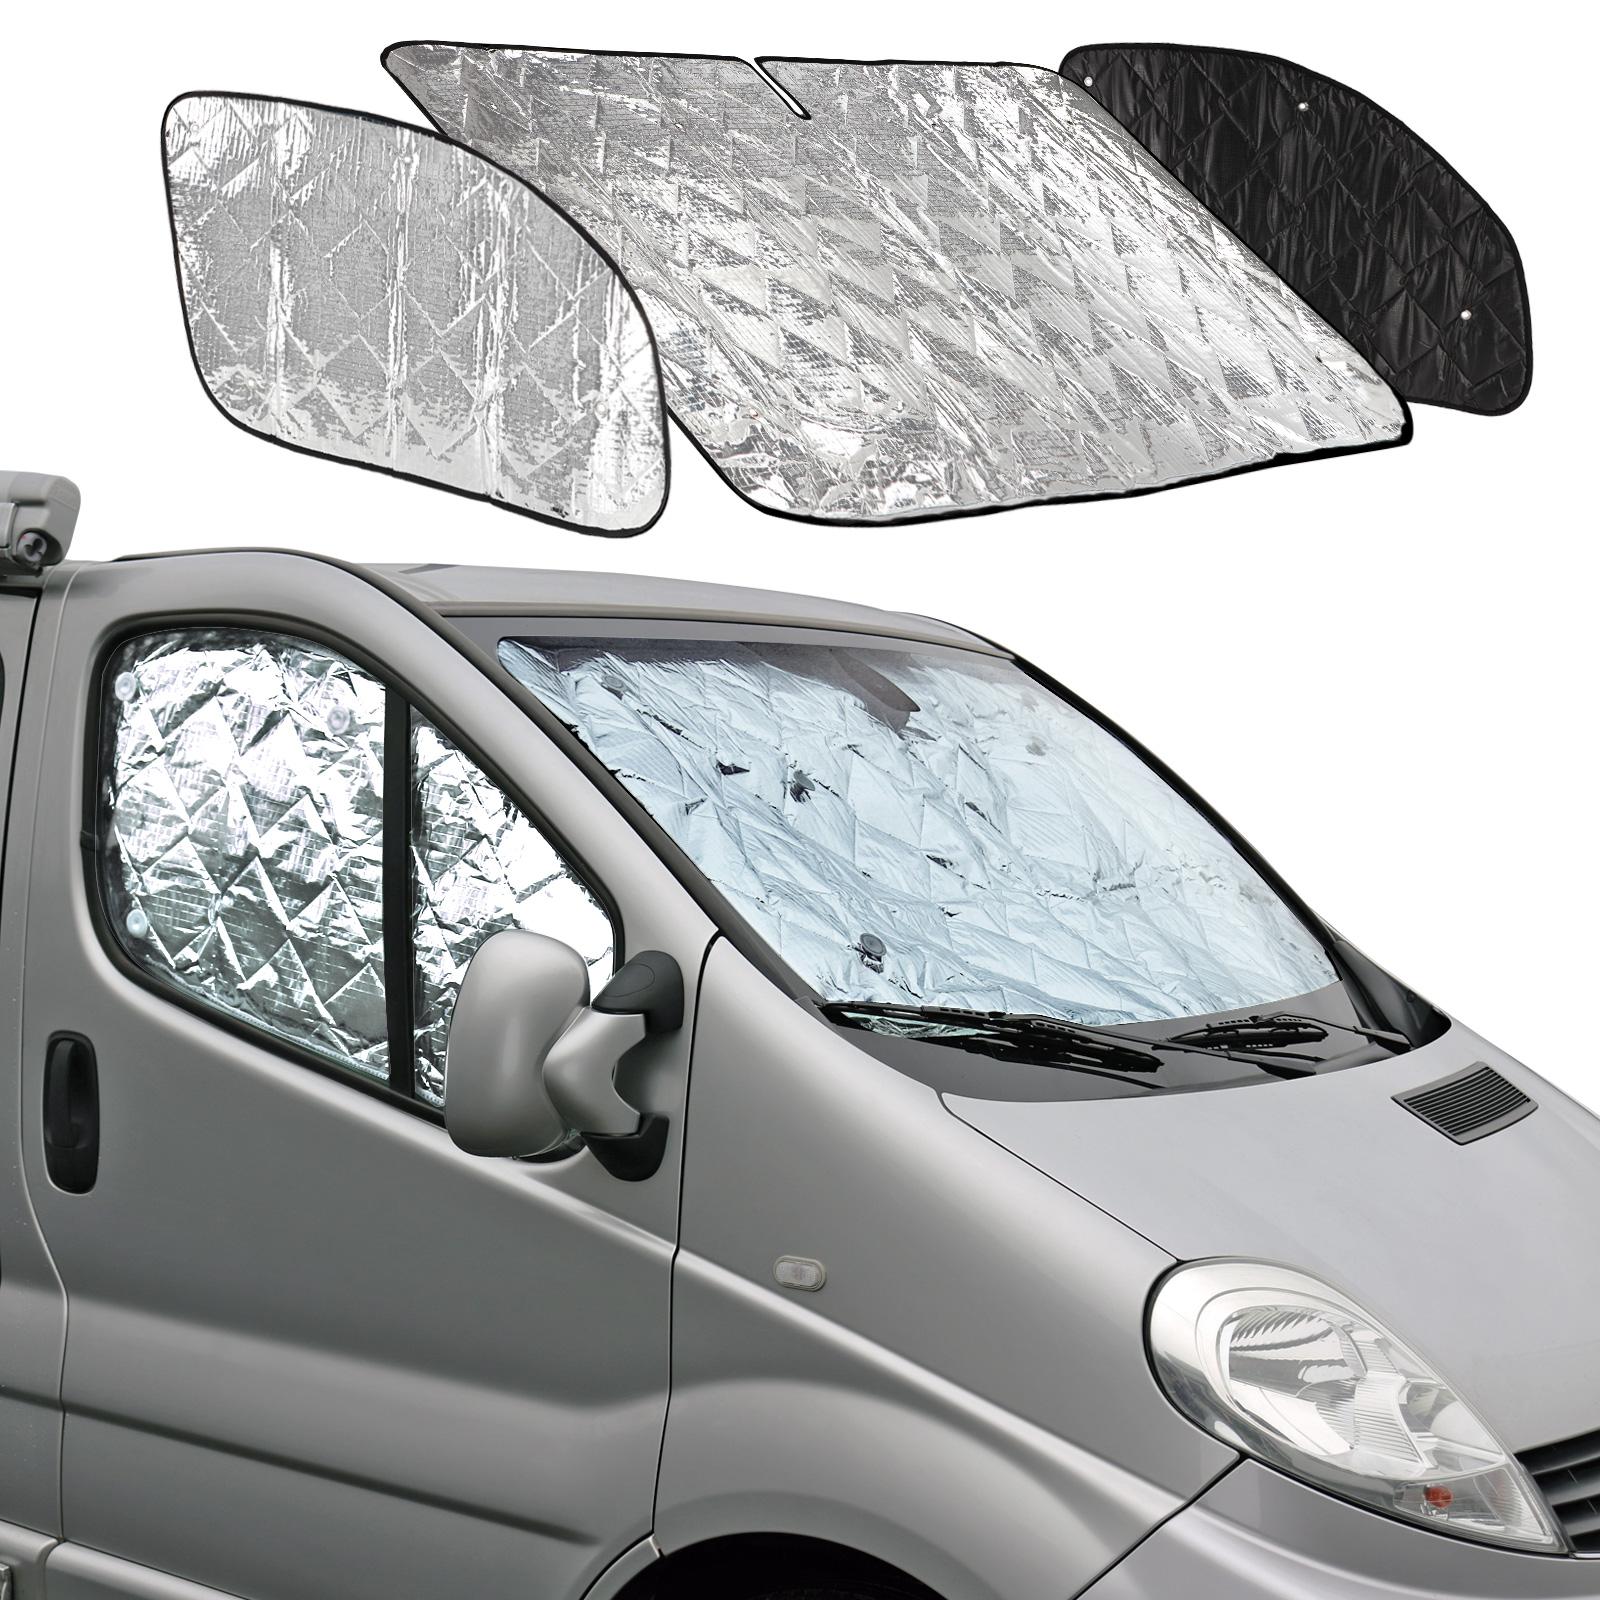 Thermomatte Fahrerhaus passend für VW-T5 & T6 alle Modelle ab Bj. 2003